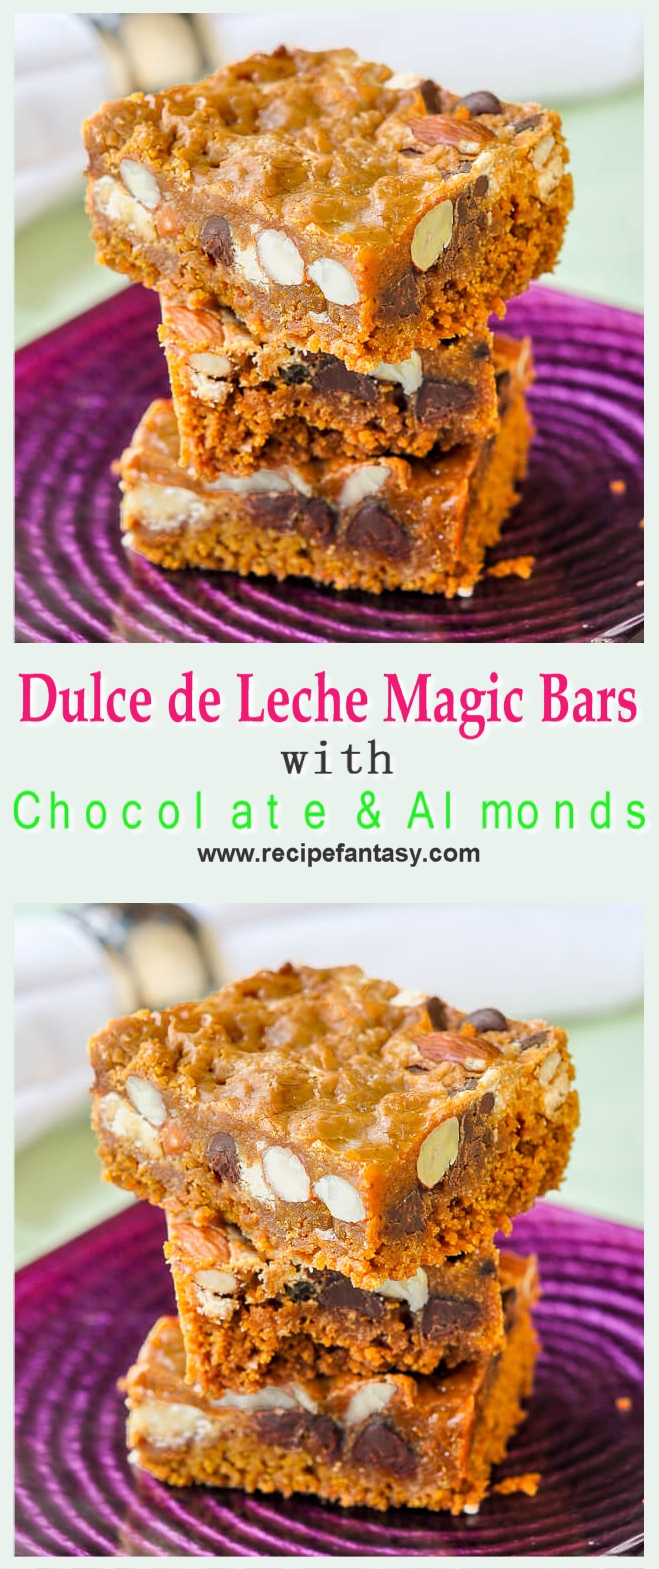 Dulce de Leche Magic Bars with Chocolate & Almonds